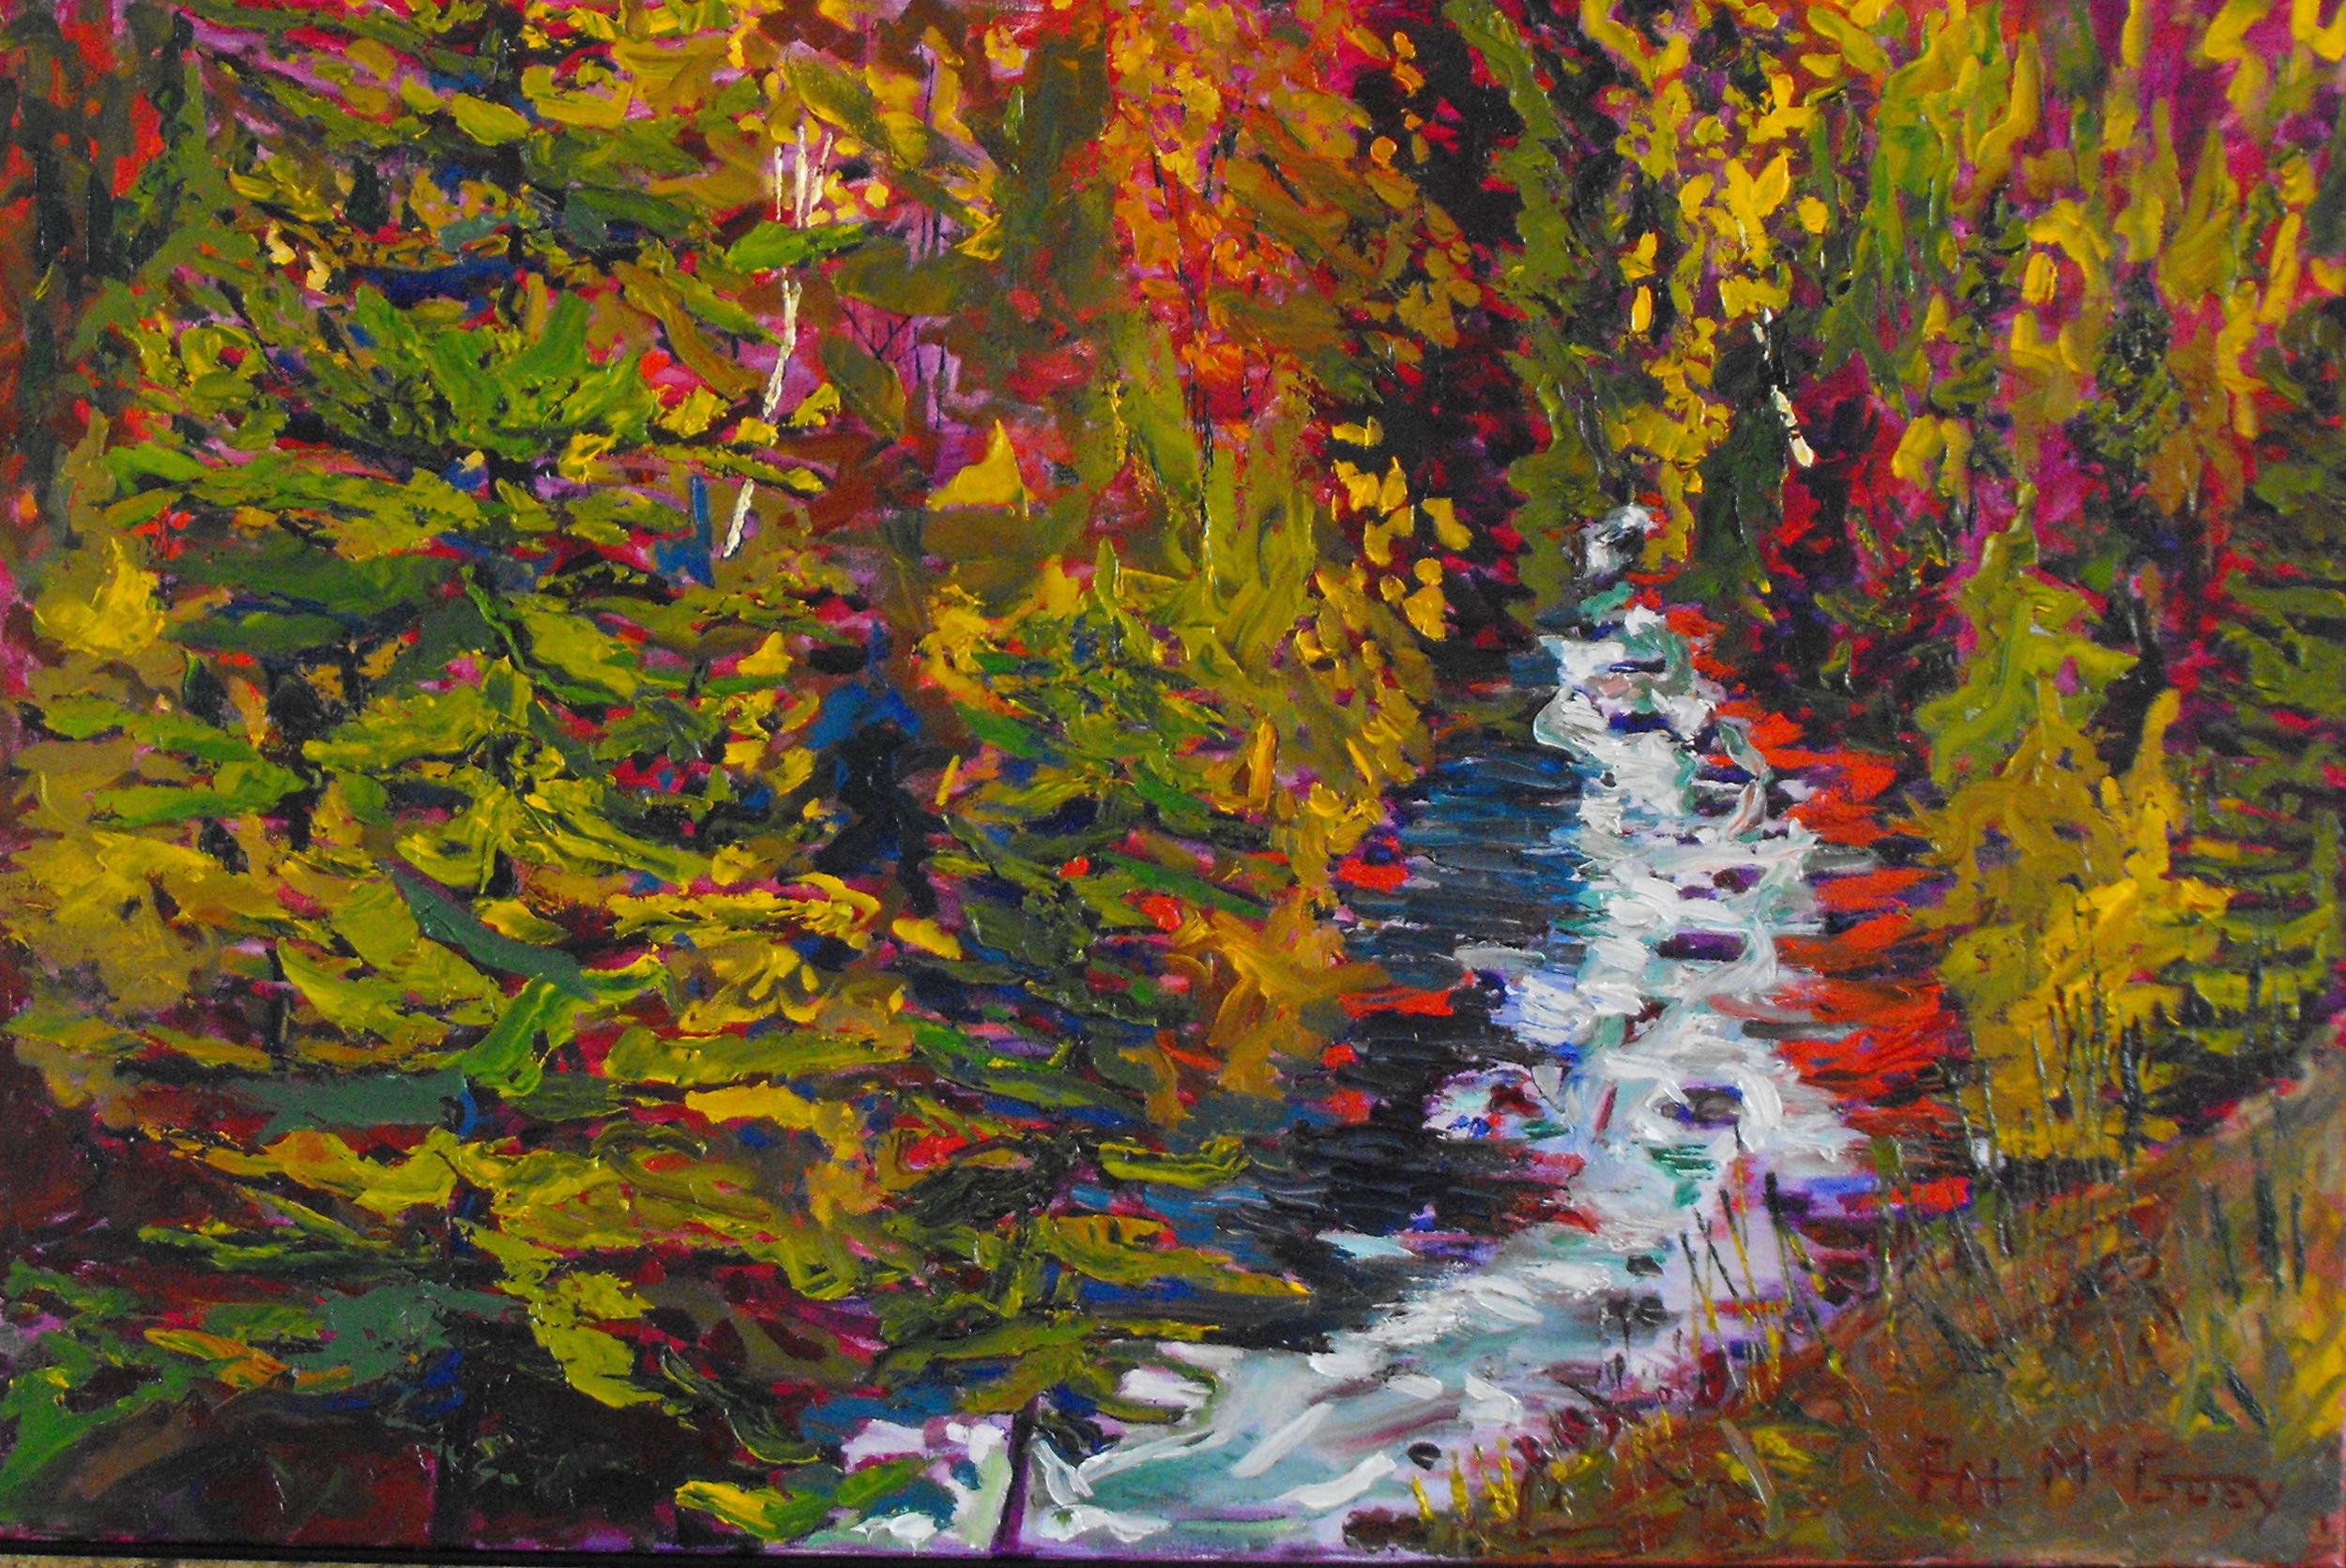 Radium Rapids, 36 X 24, Oil on Canvas